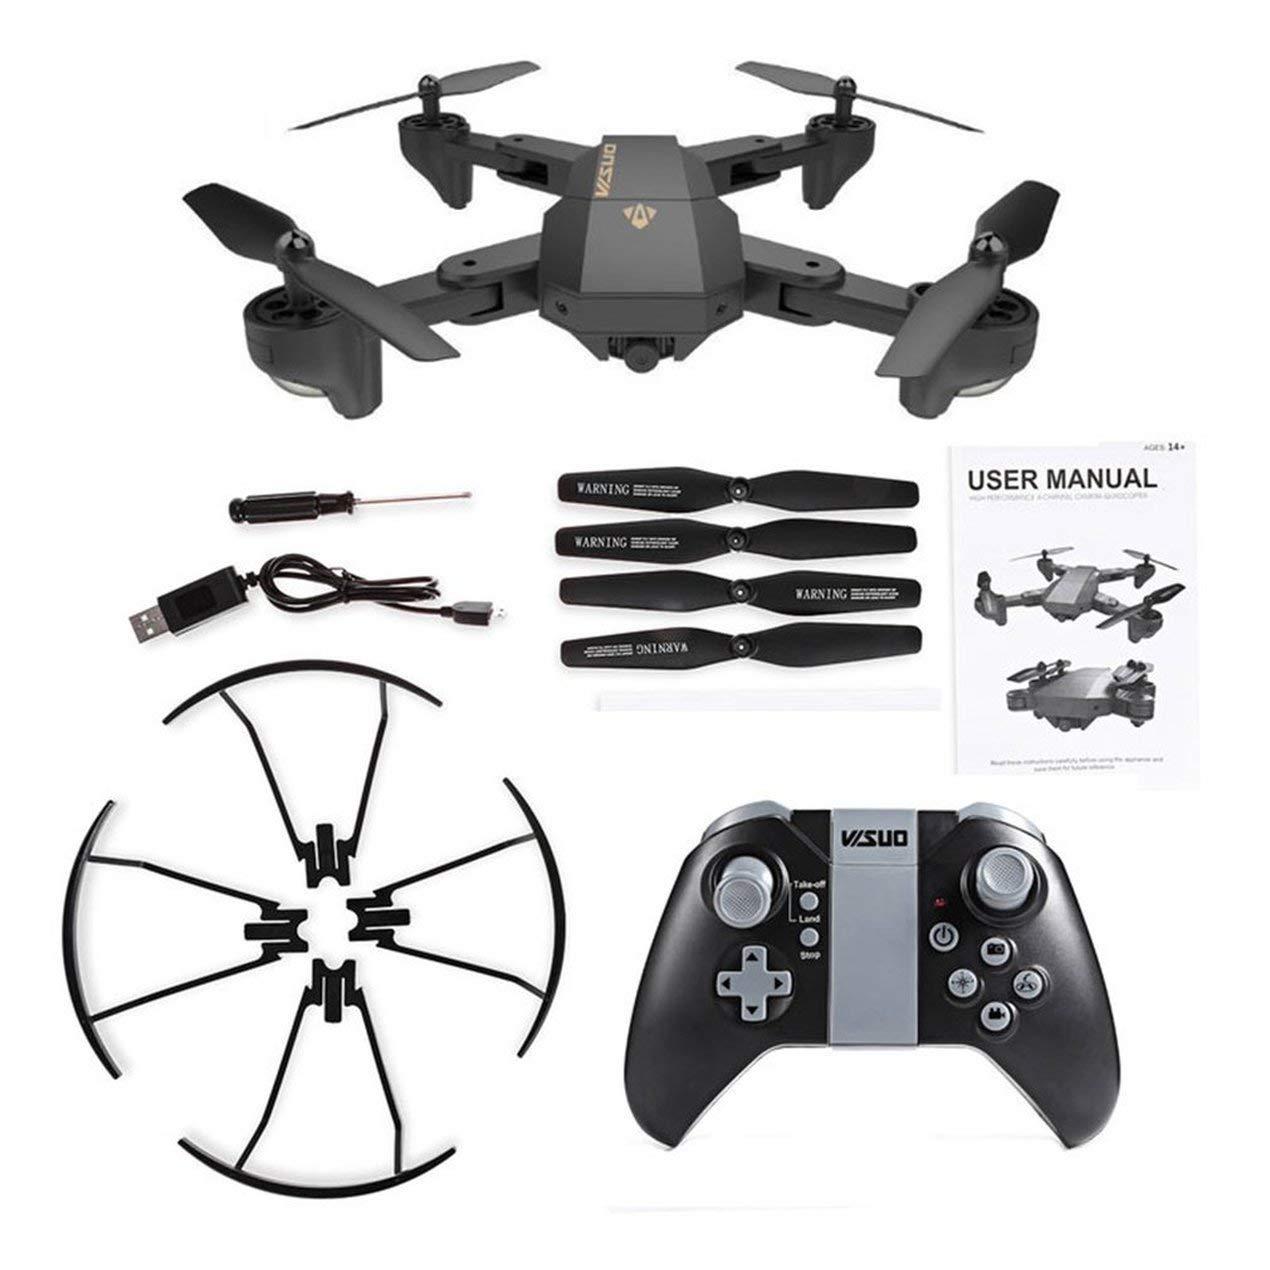 Drone WiFi Plegable 2.4G 4-Axis, One Key Return Quadcopter RC Plegable Modo sin Cabeza con cámara 30W, para fotografía aérea Interior y Exterior